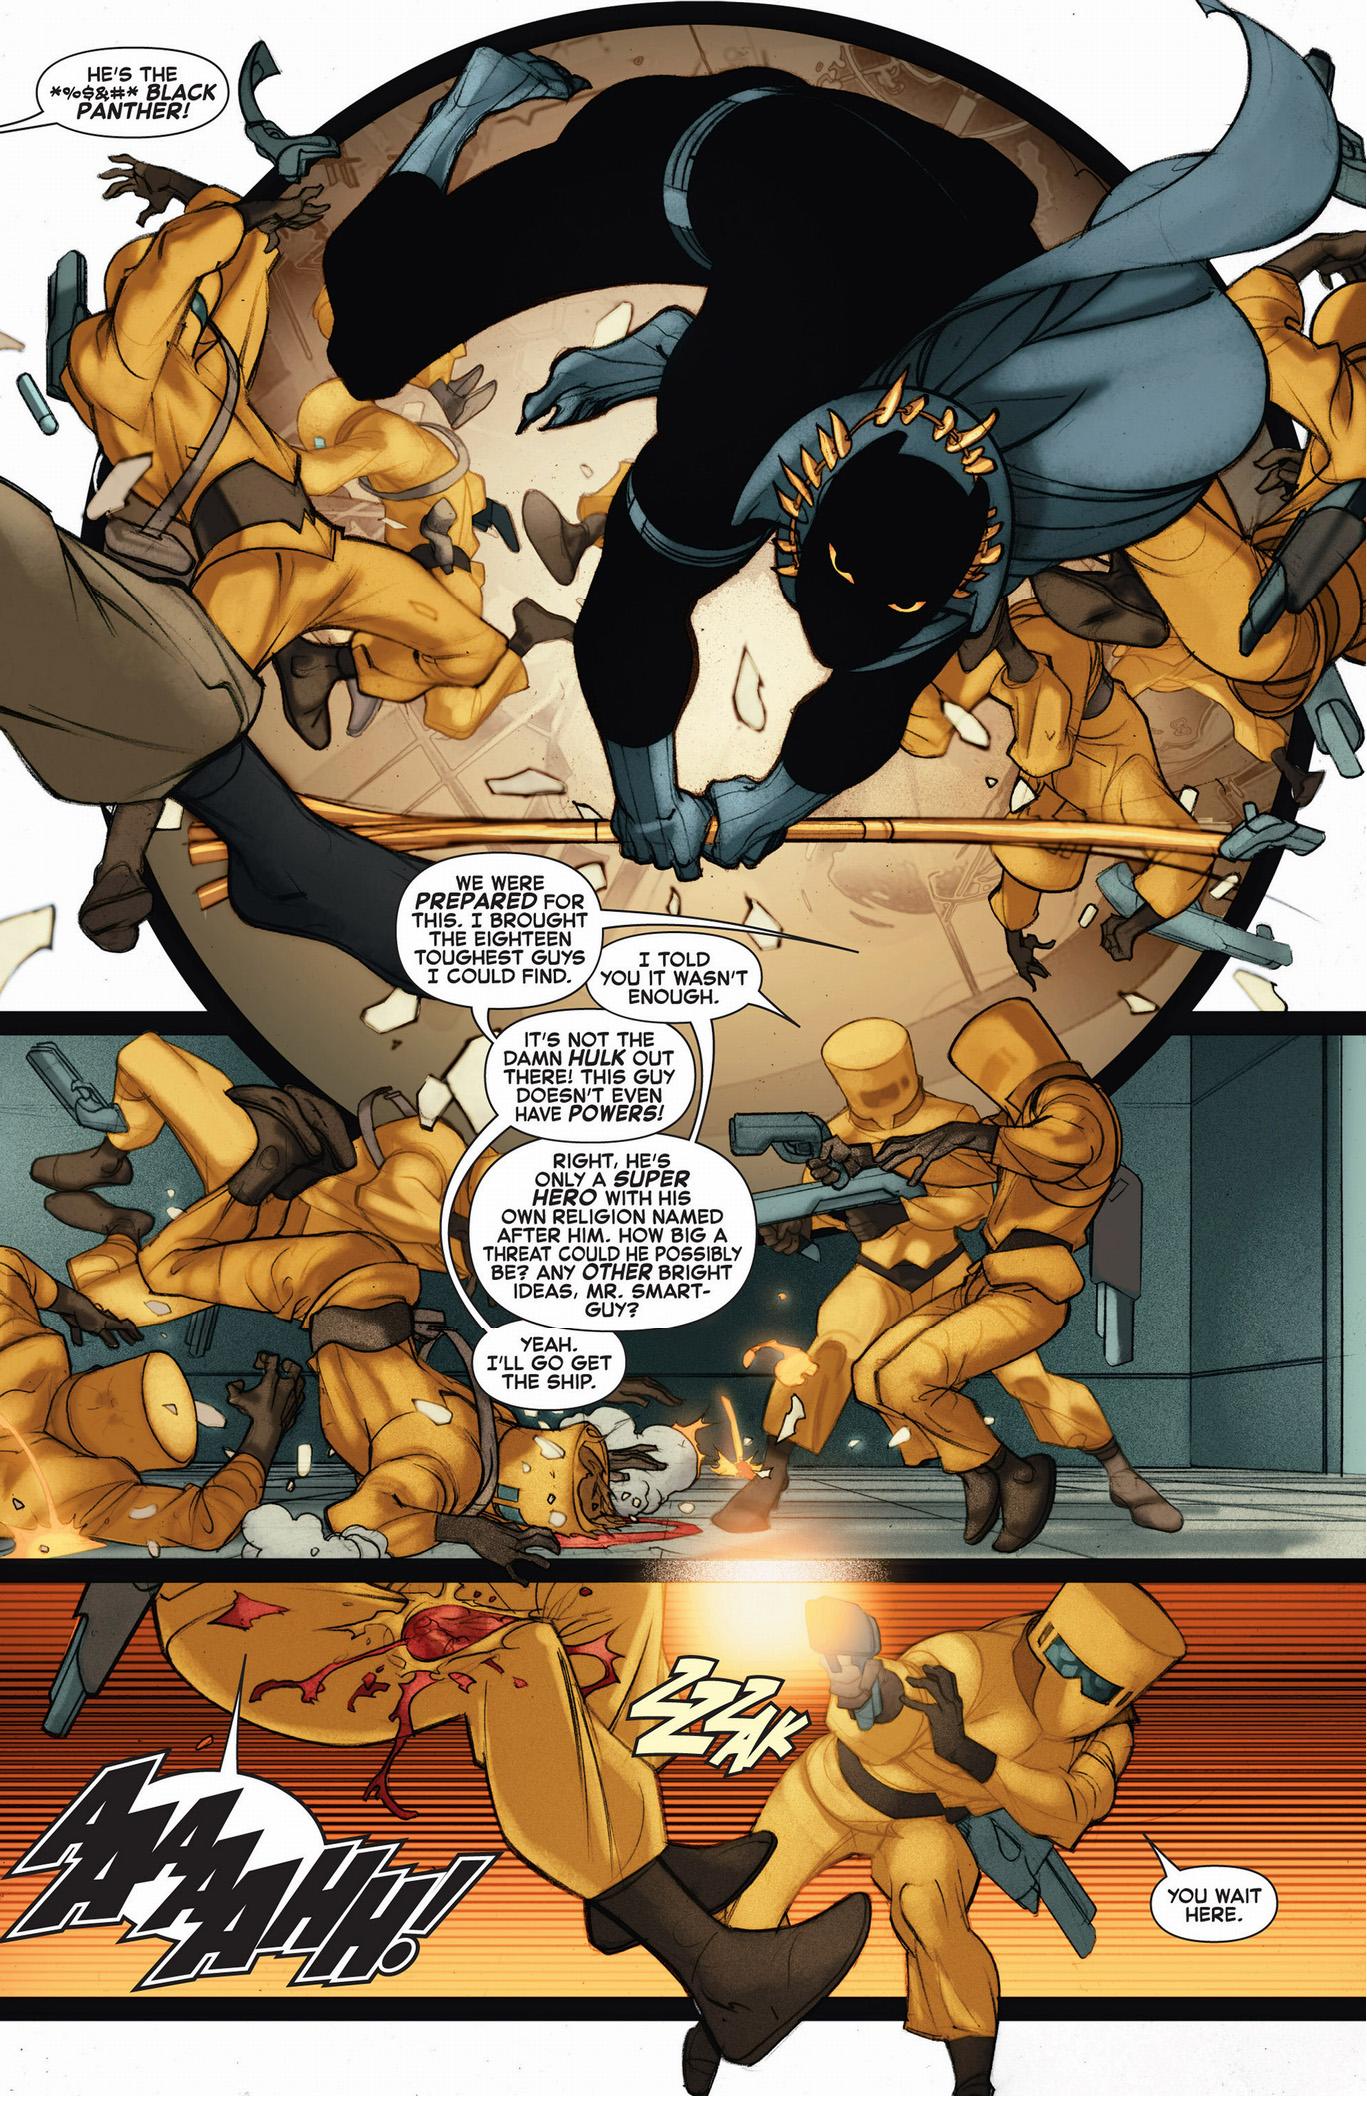 black panther vs aim henchmen